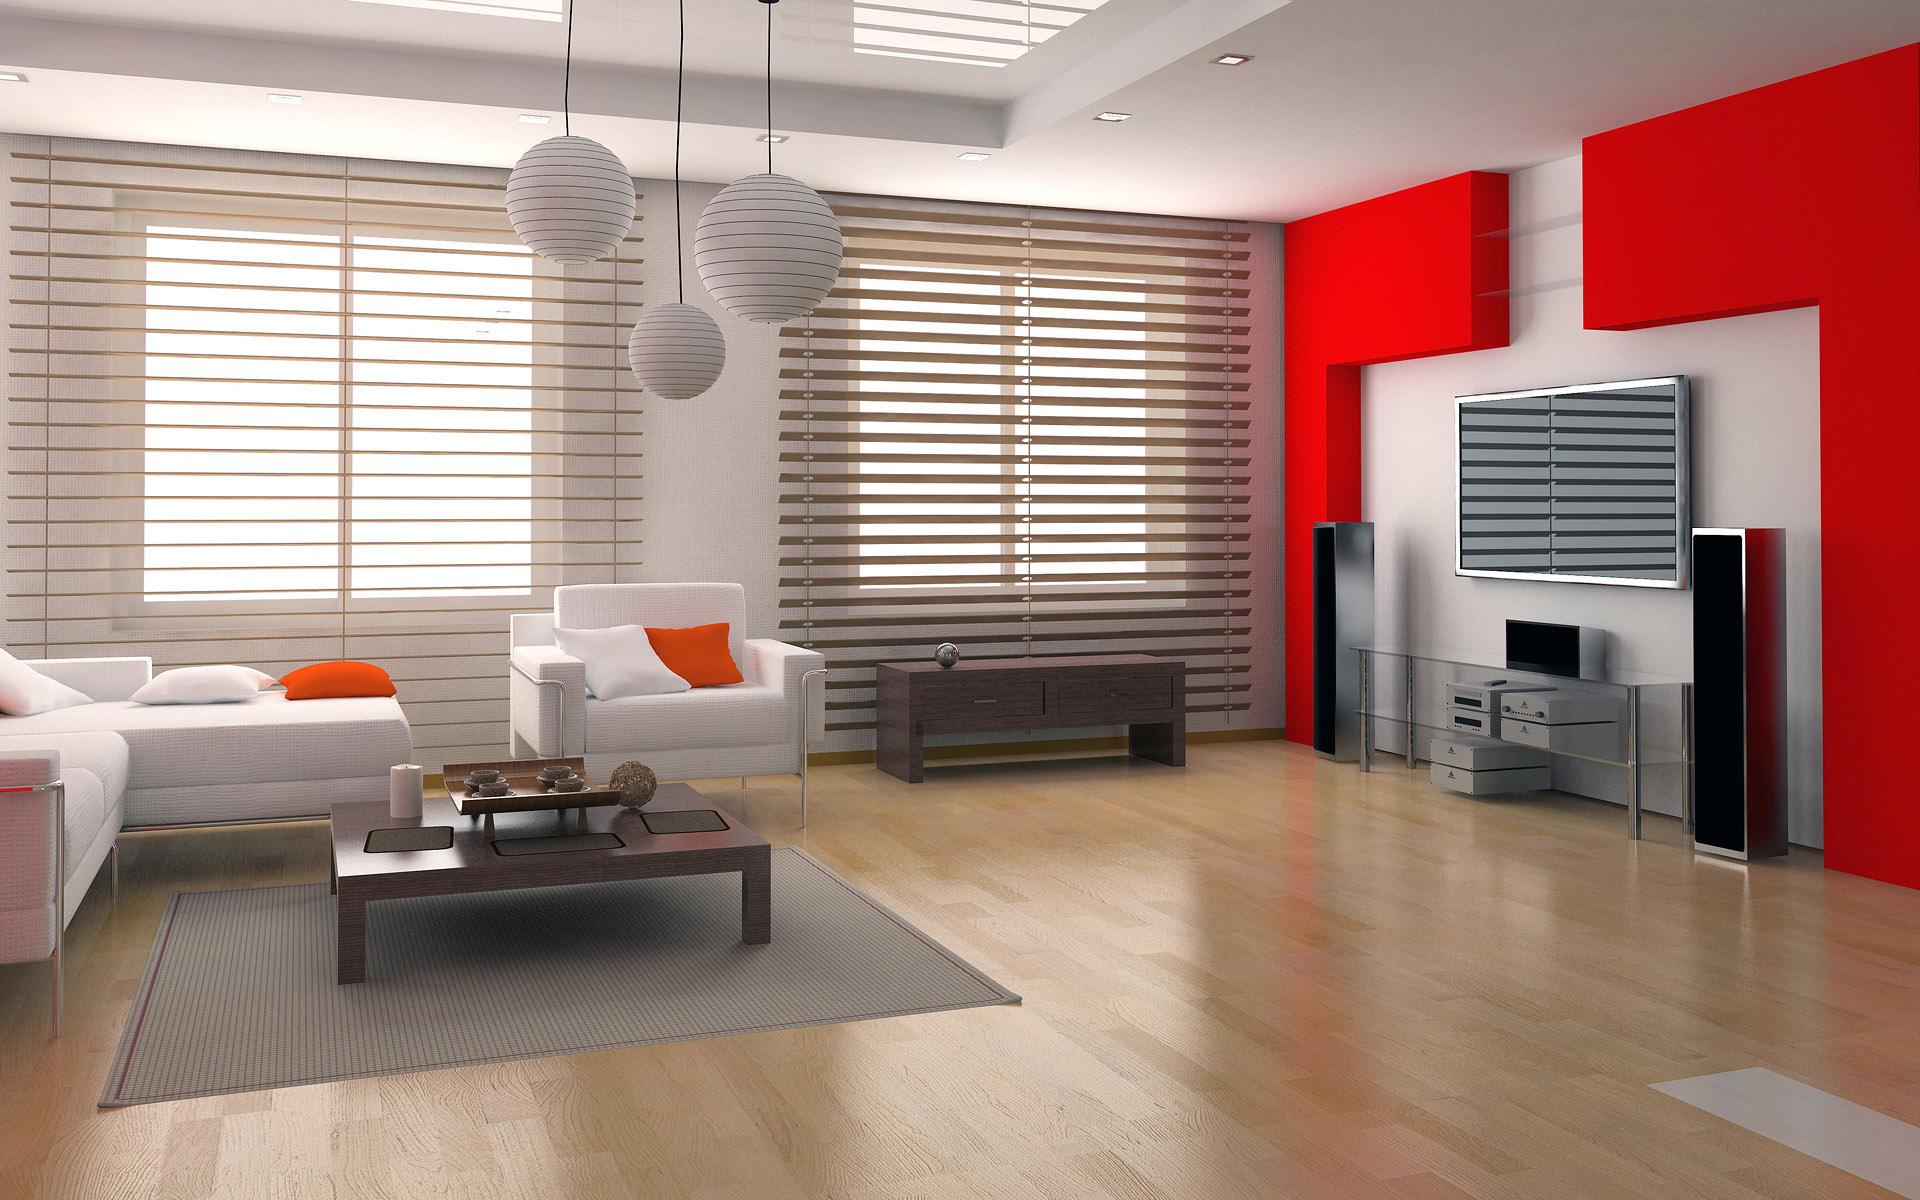 house interior design ideas modest interior house designs on house 25 best VGLDCNZ